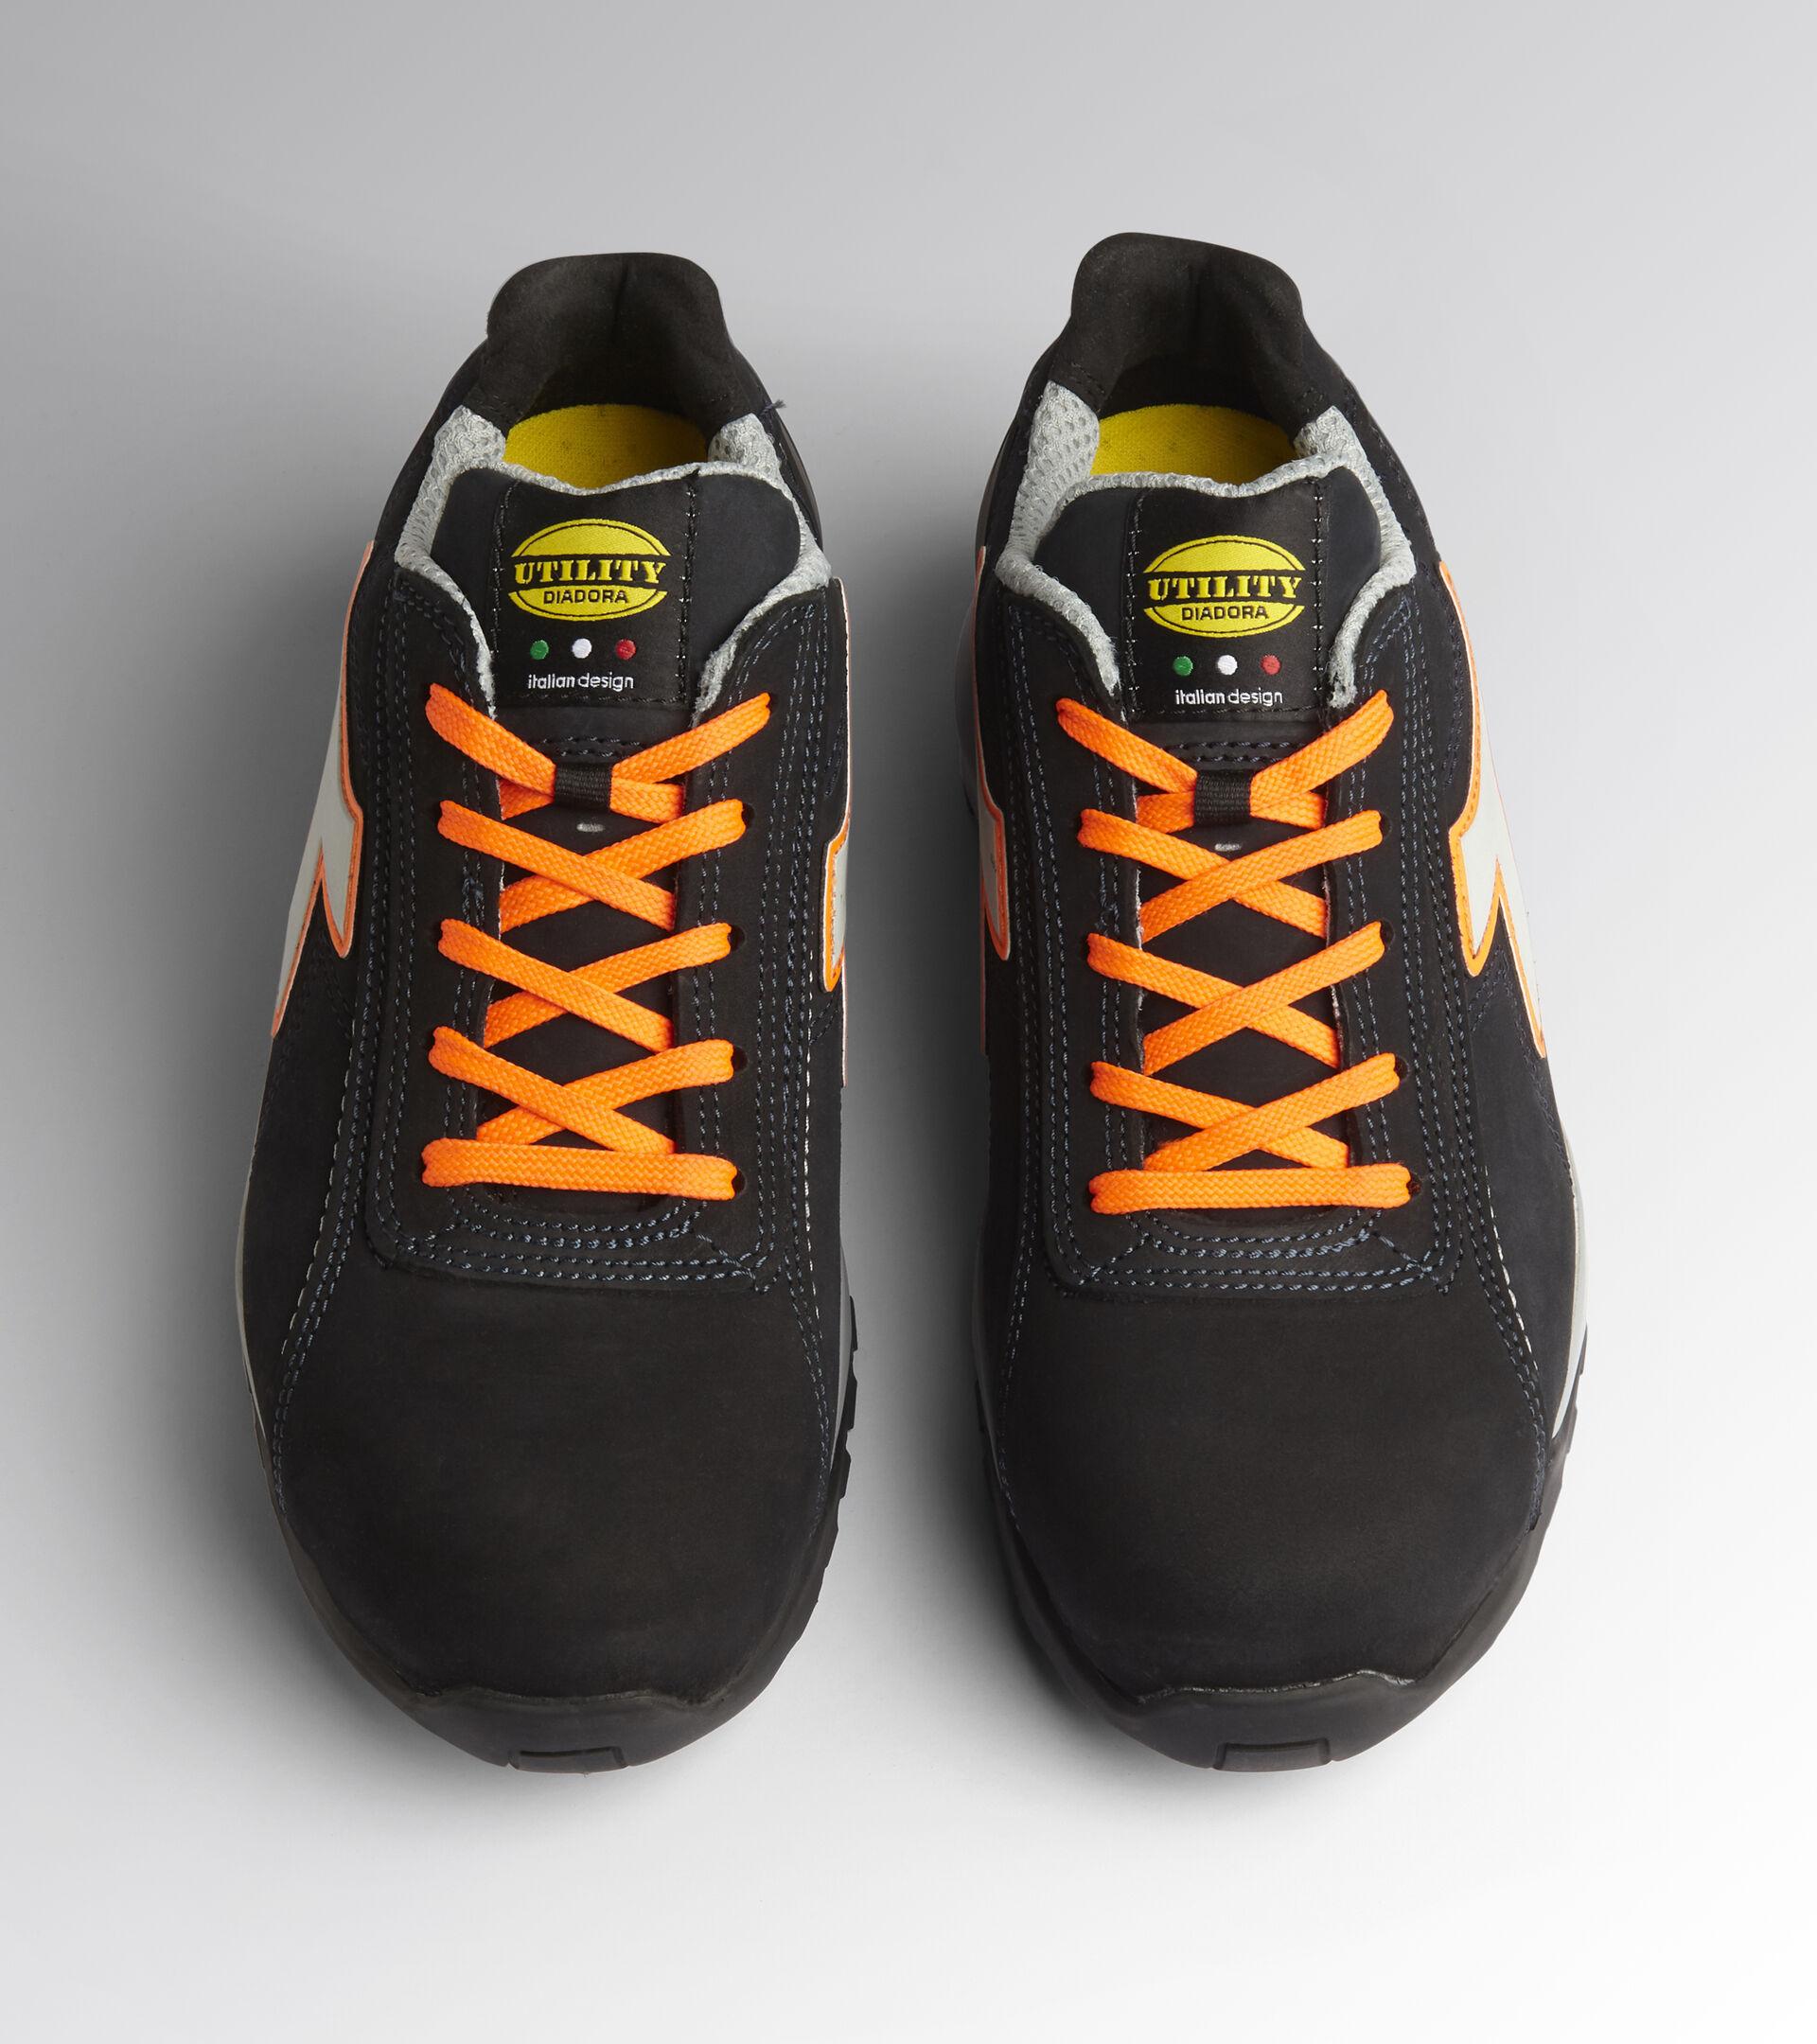 Footwear Utility UNISEX GLOVE MDS LOW S3 HRO SRC DARK NAVY/ORANGE FLUO Utility